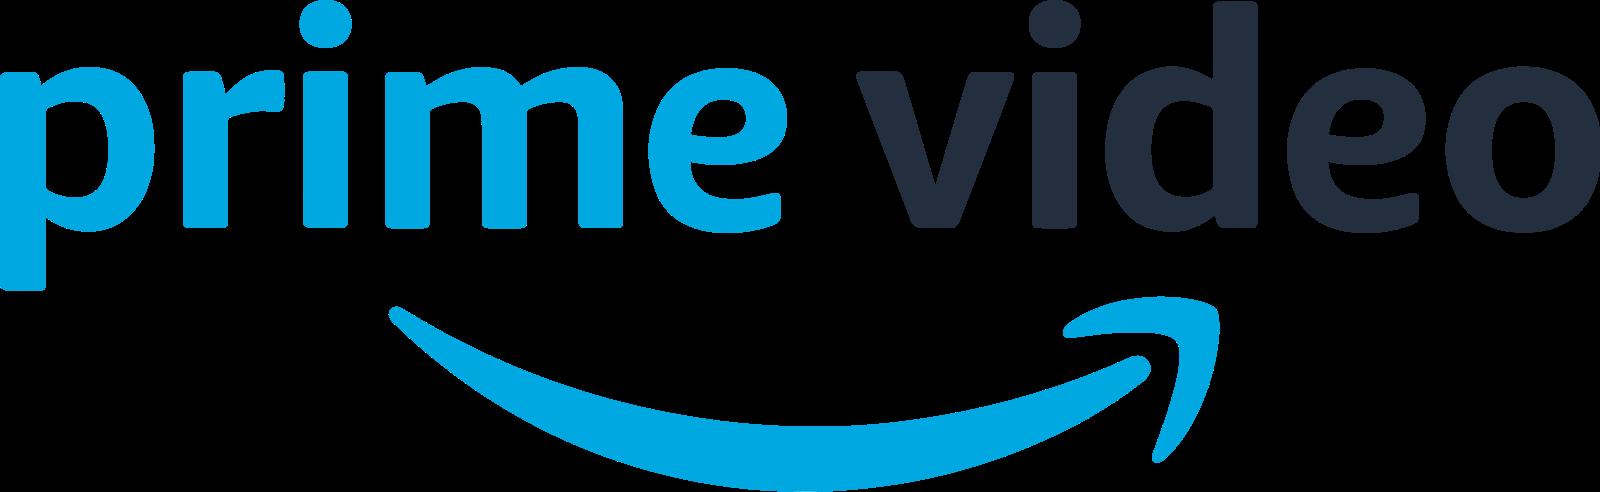 1600px-Amazon_Prime_Video_logo.png